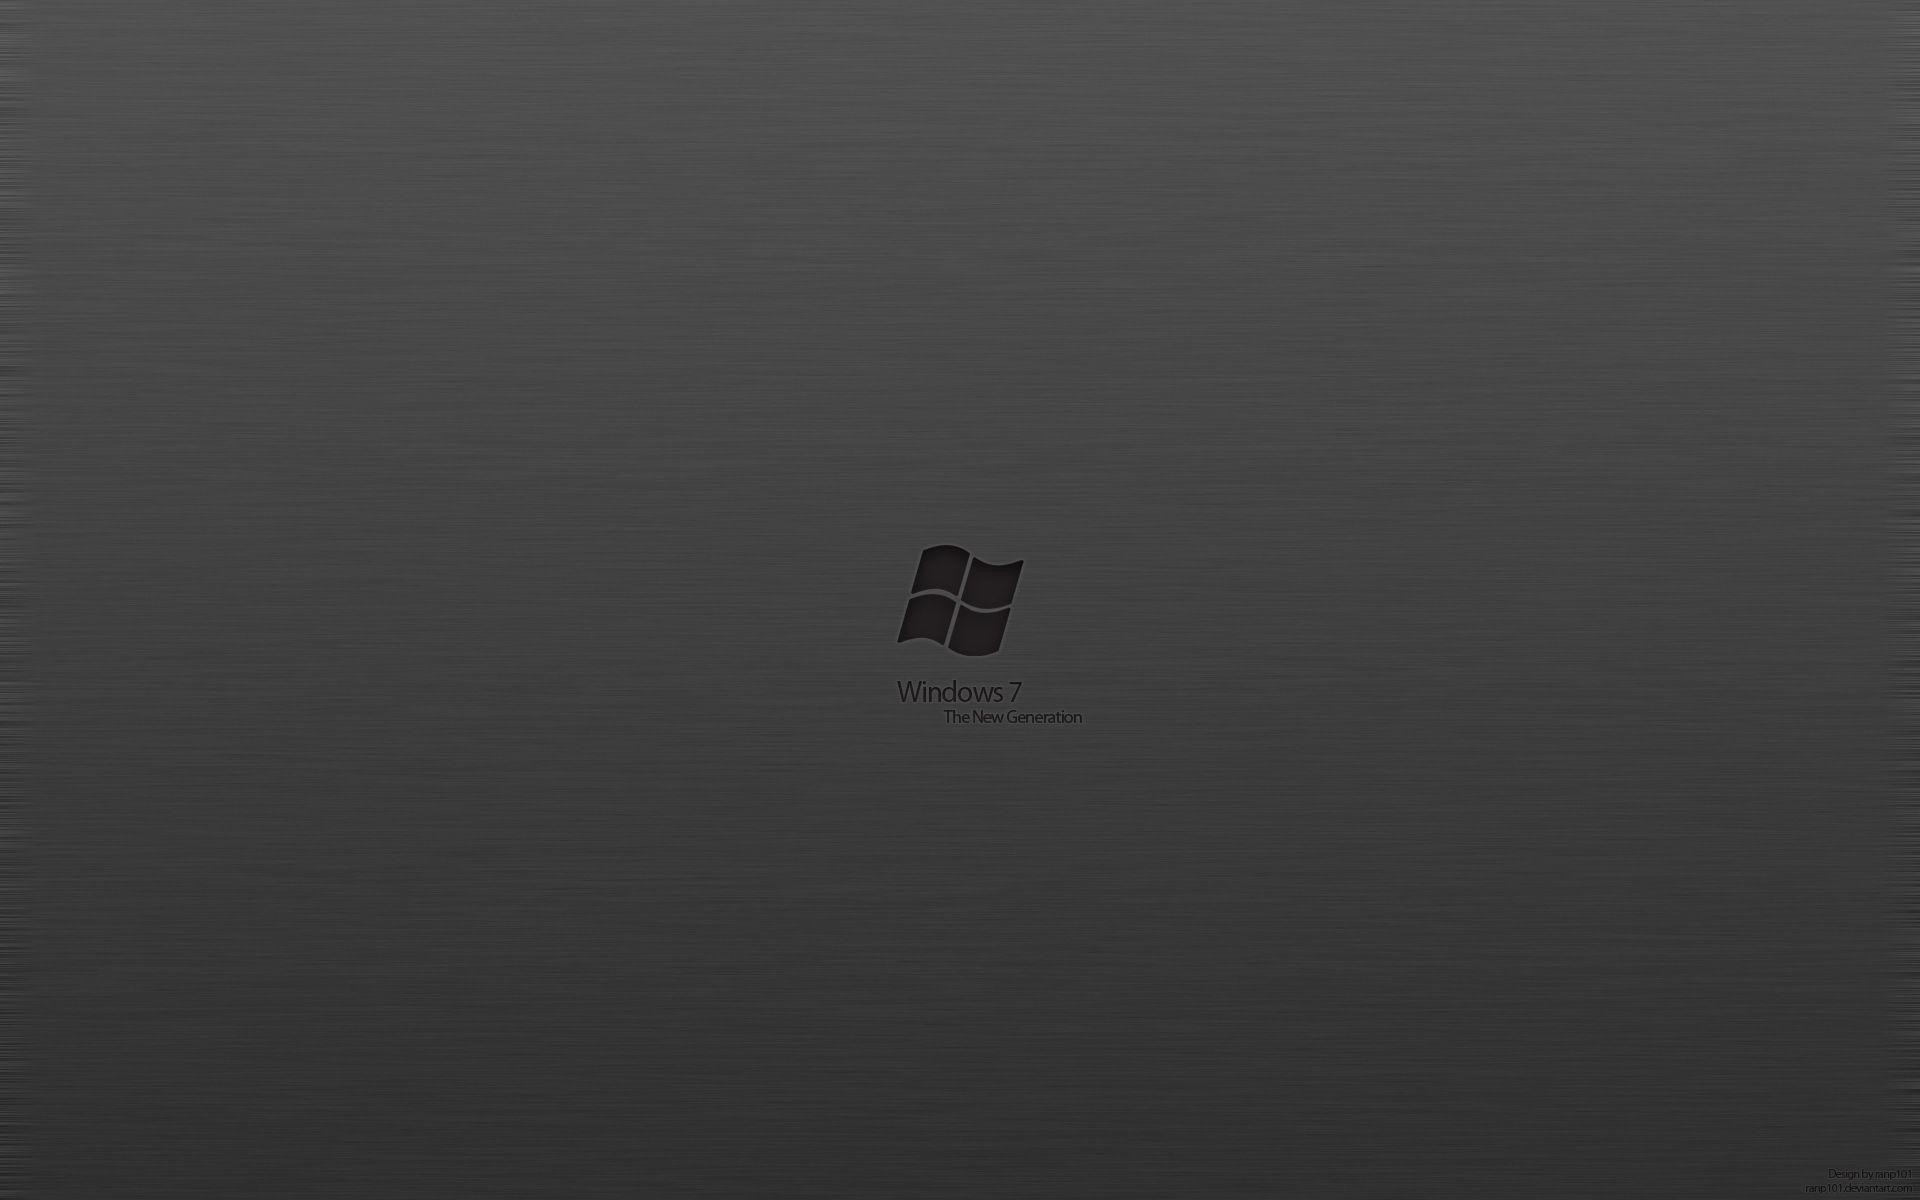 … 10 dark windows 7 wallpapers for desktop wallinsider com …